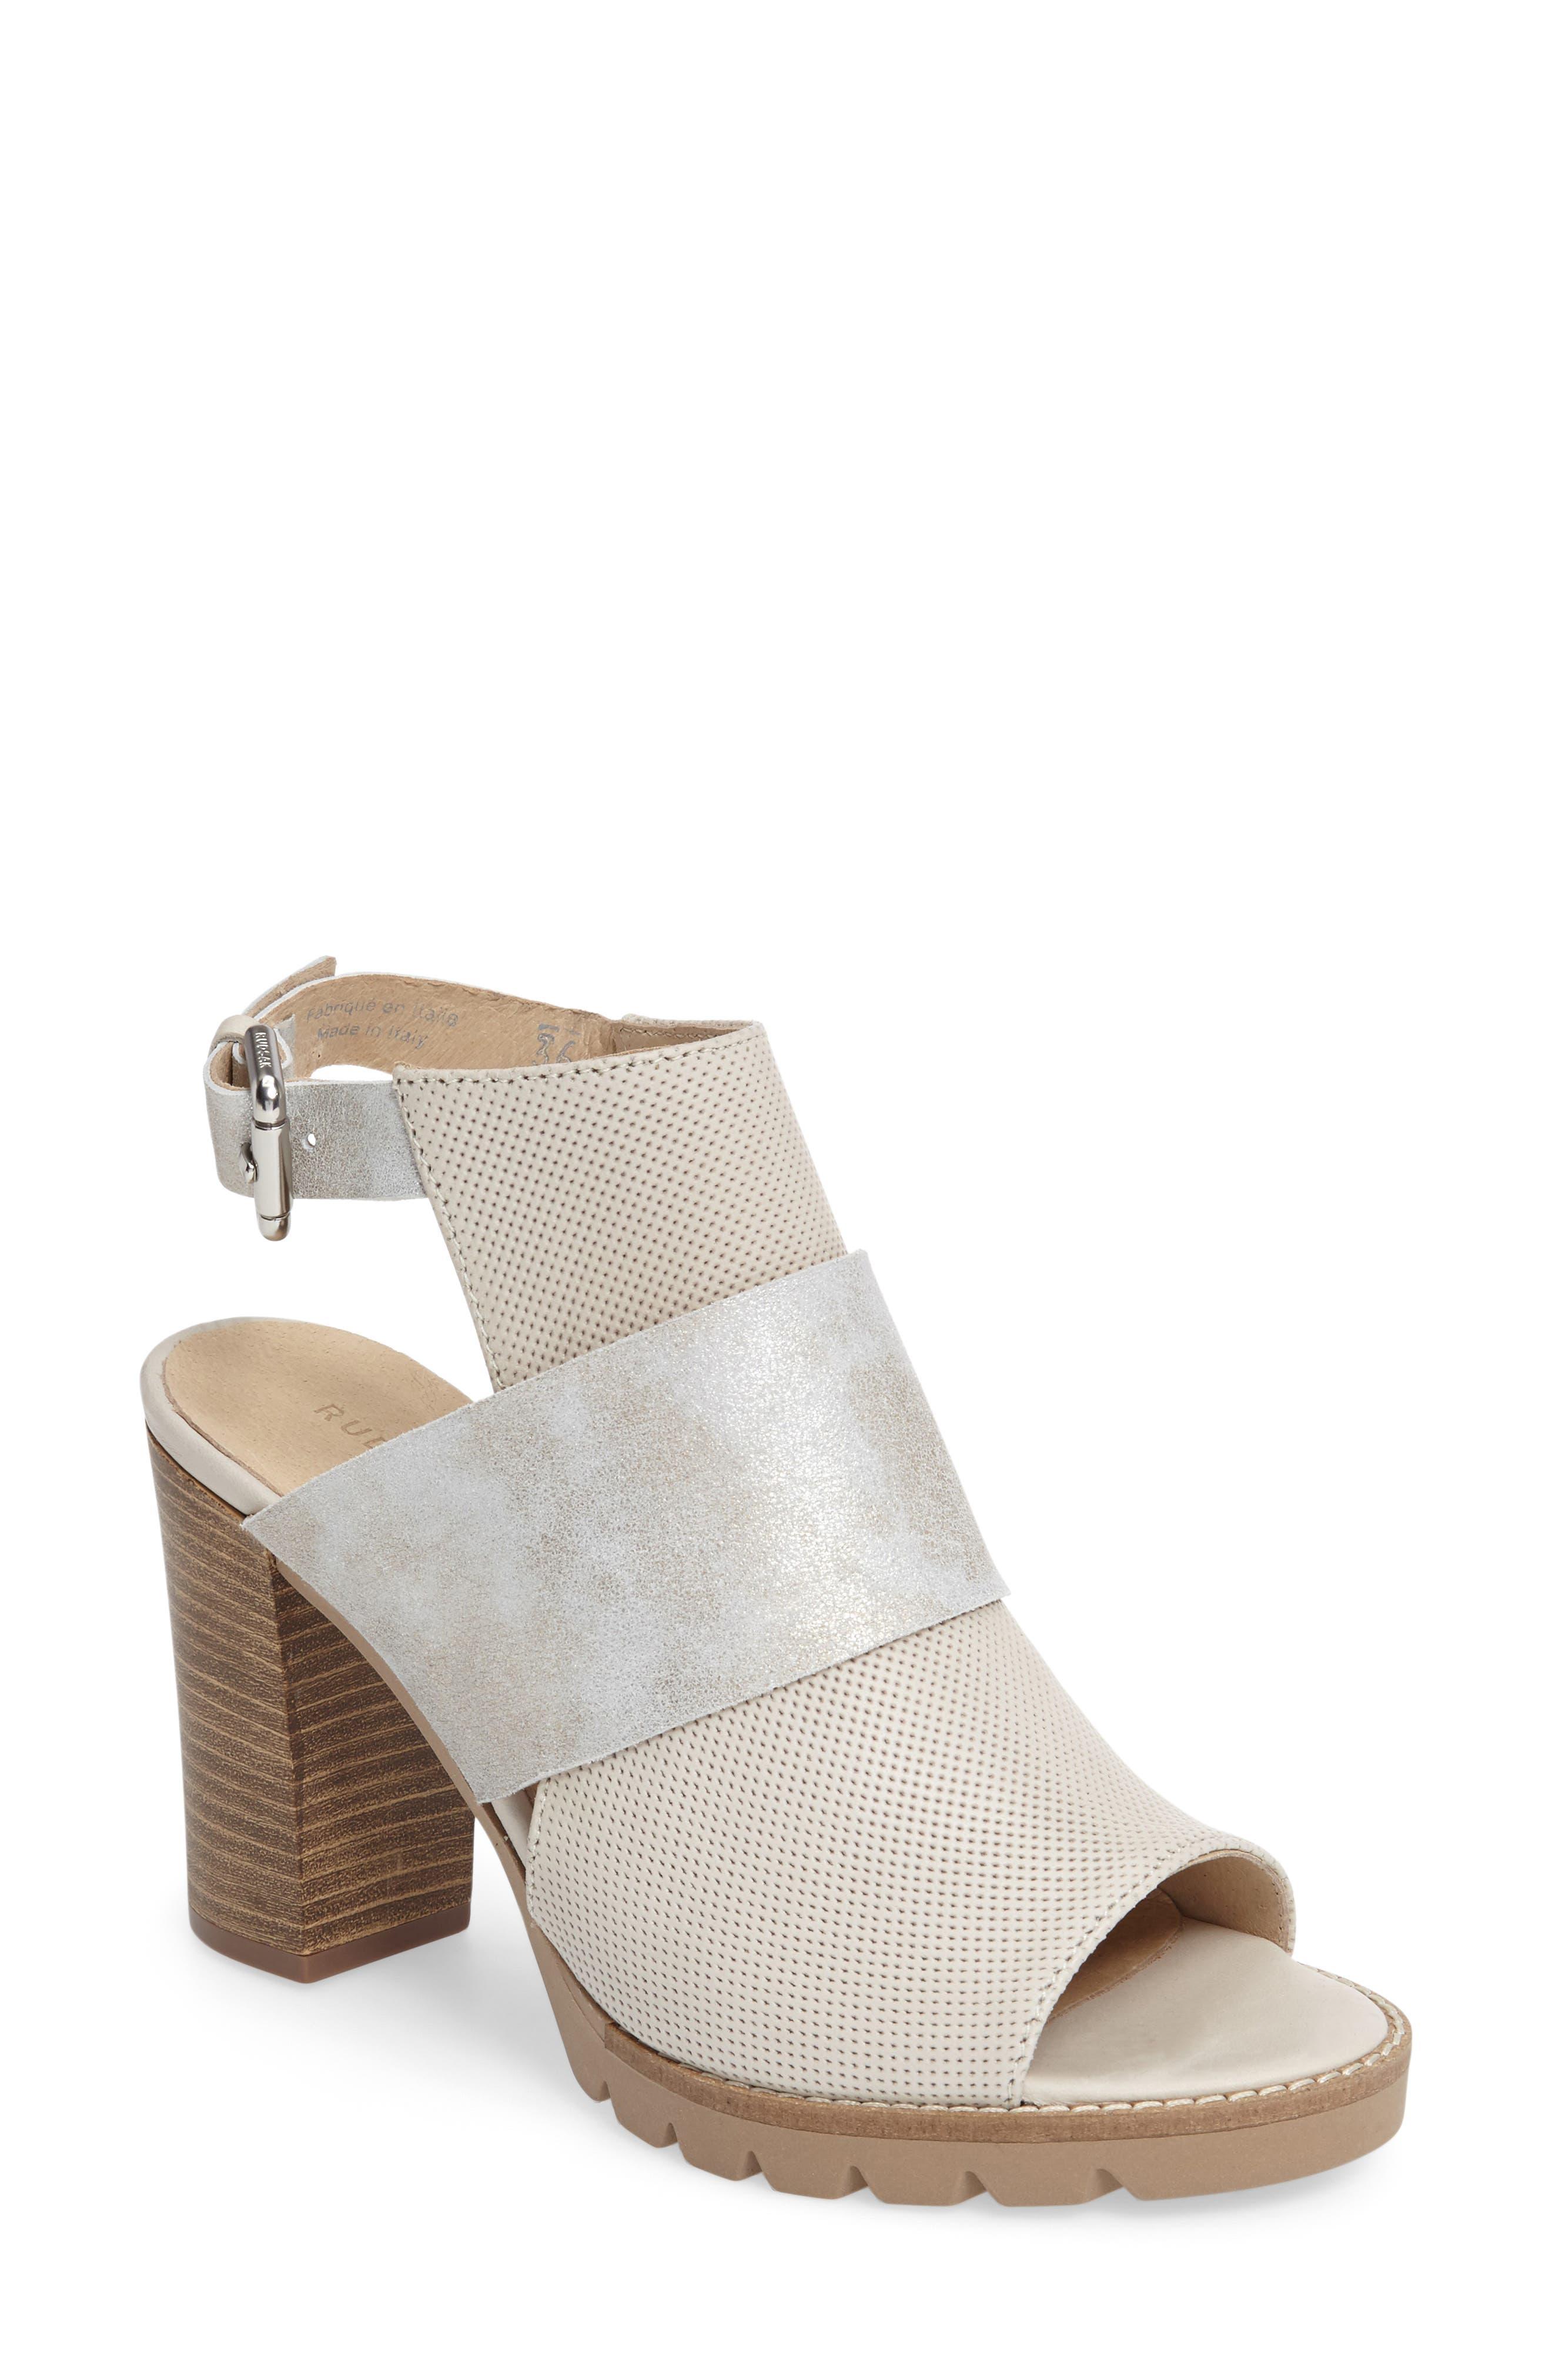 Main Image - Rudsak Brittni Block Heel Sandal (Women)